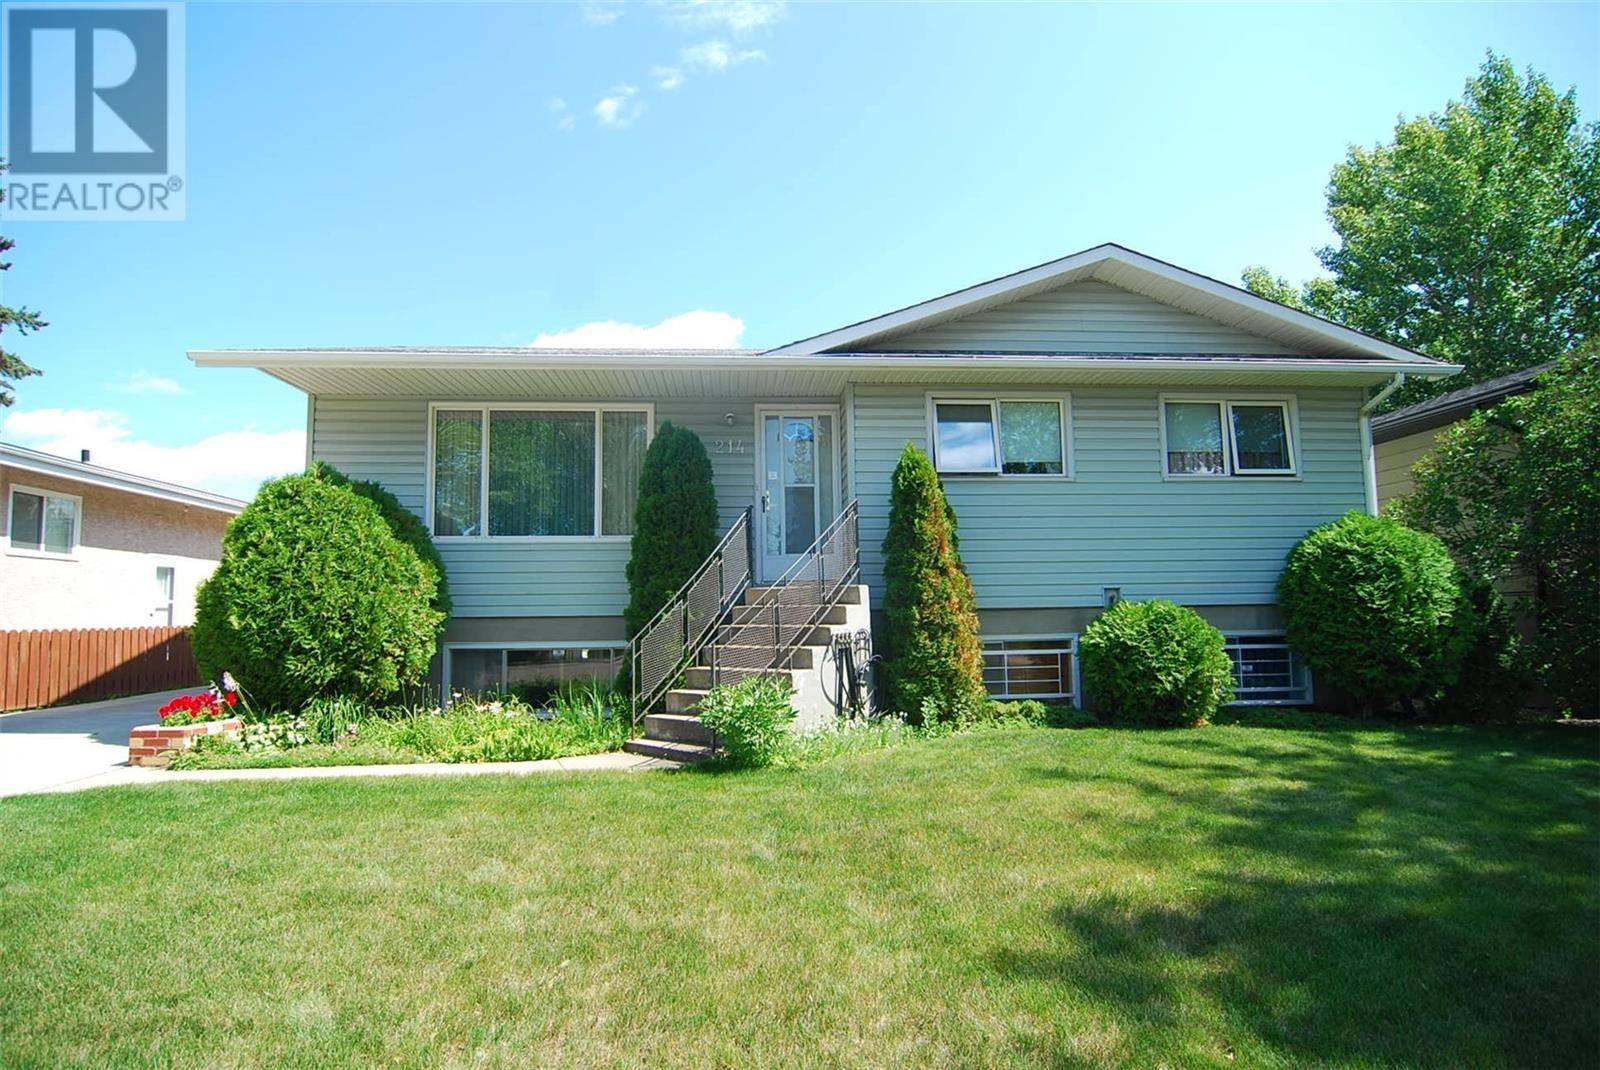 House for sale at 214 Vancouver Ave N Saskatoon Saskatchewan - MLS: SK789511